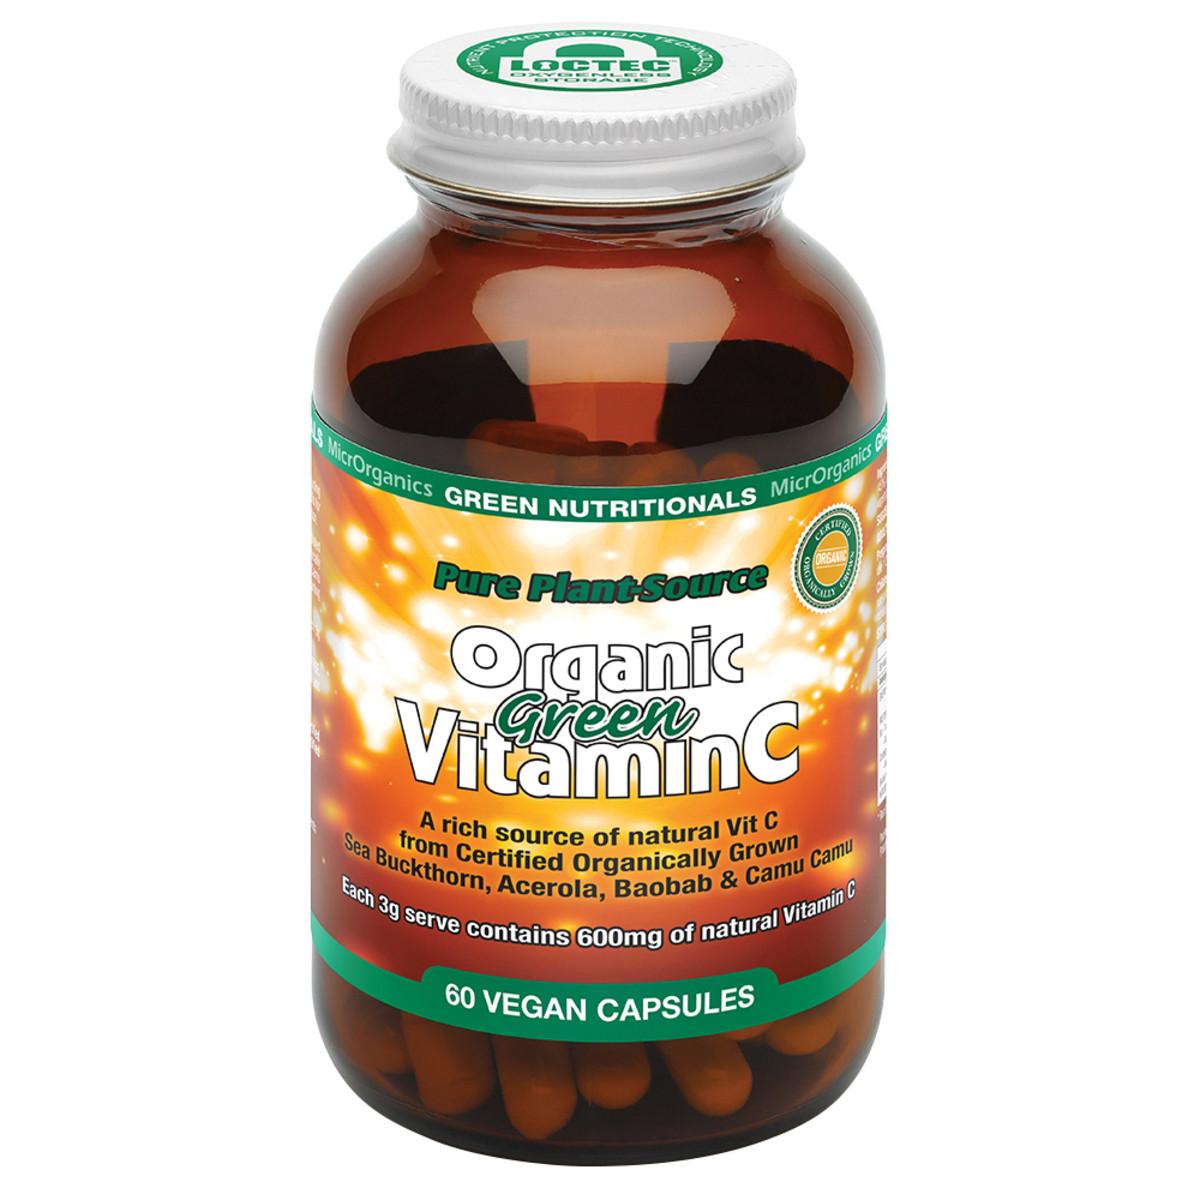 MICRORGANICS GREEN NUTRITIONALS ORGANIC GREEN VITAMIN C 60C